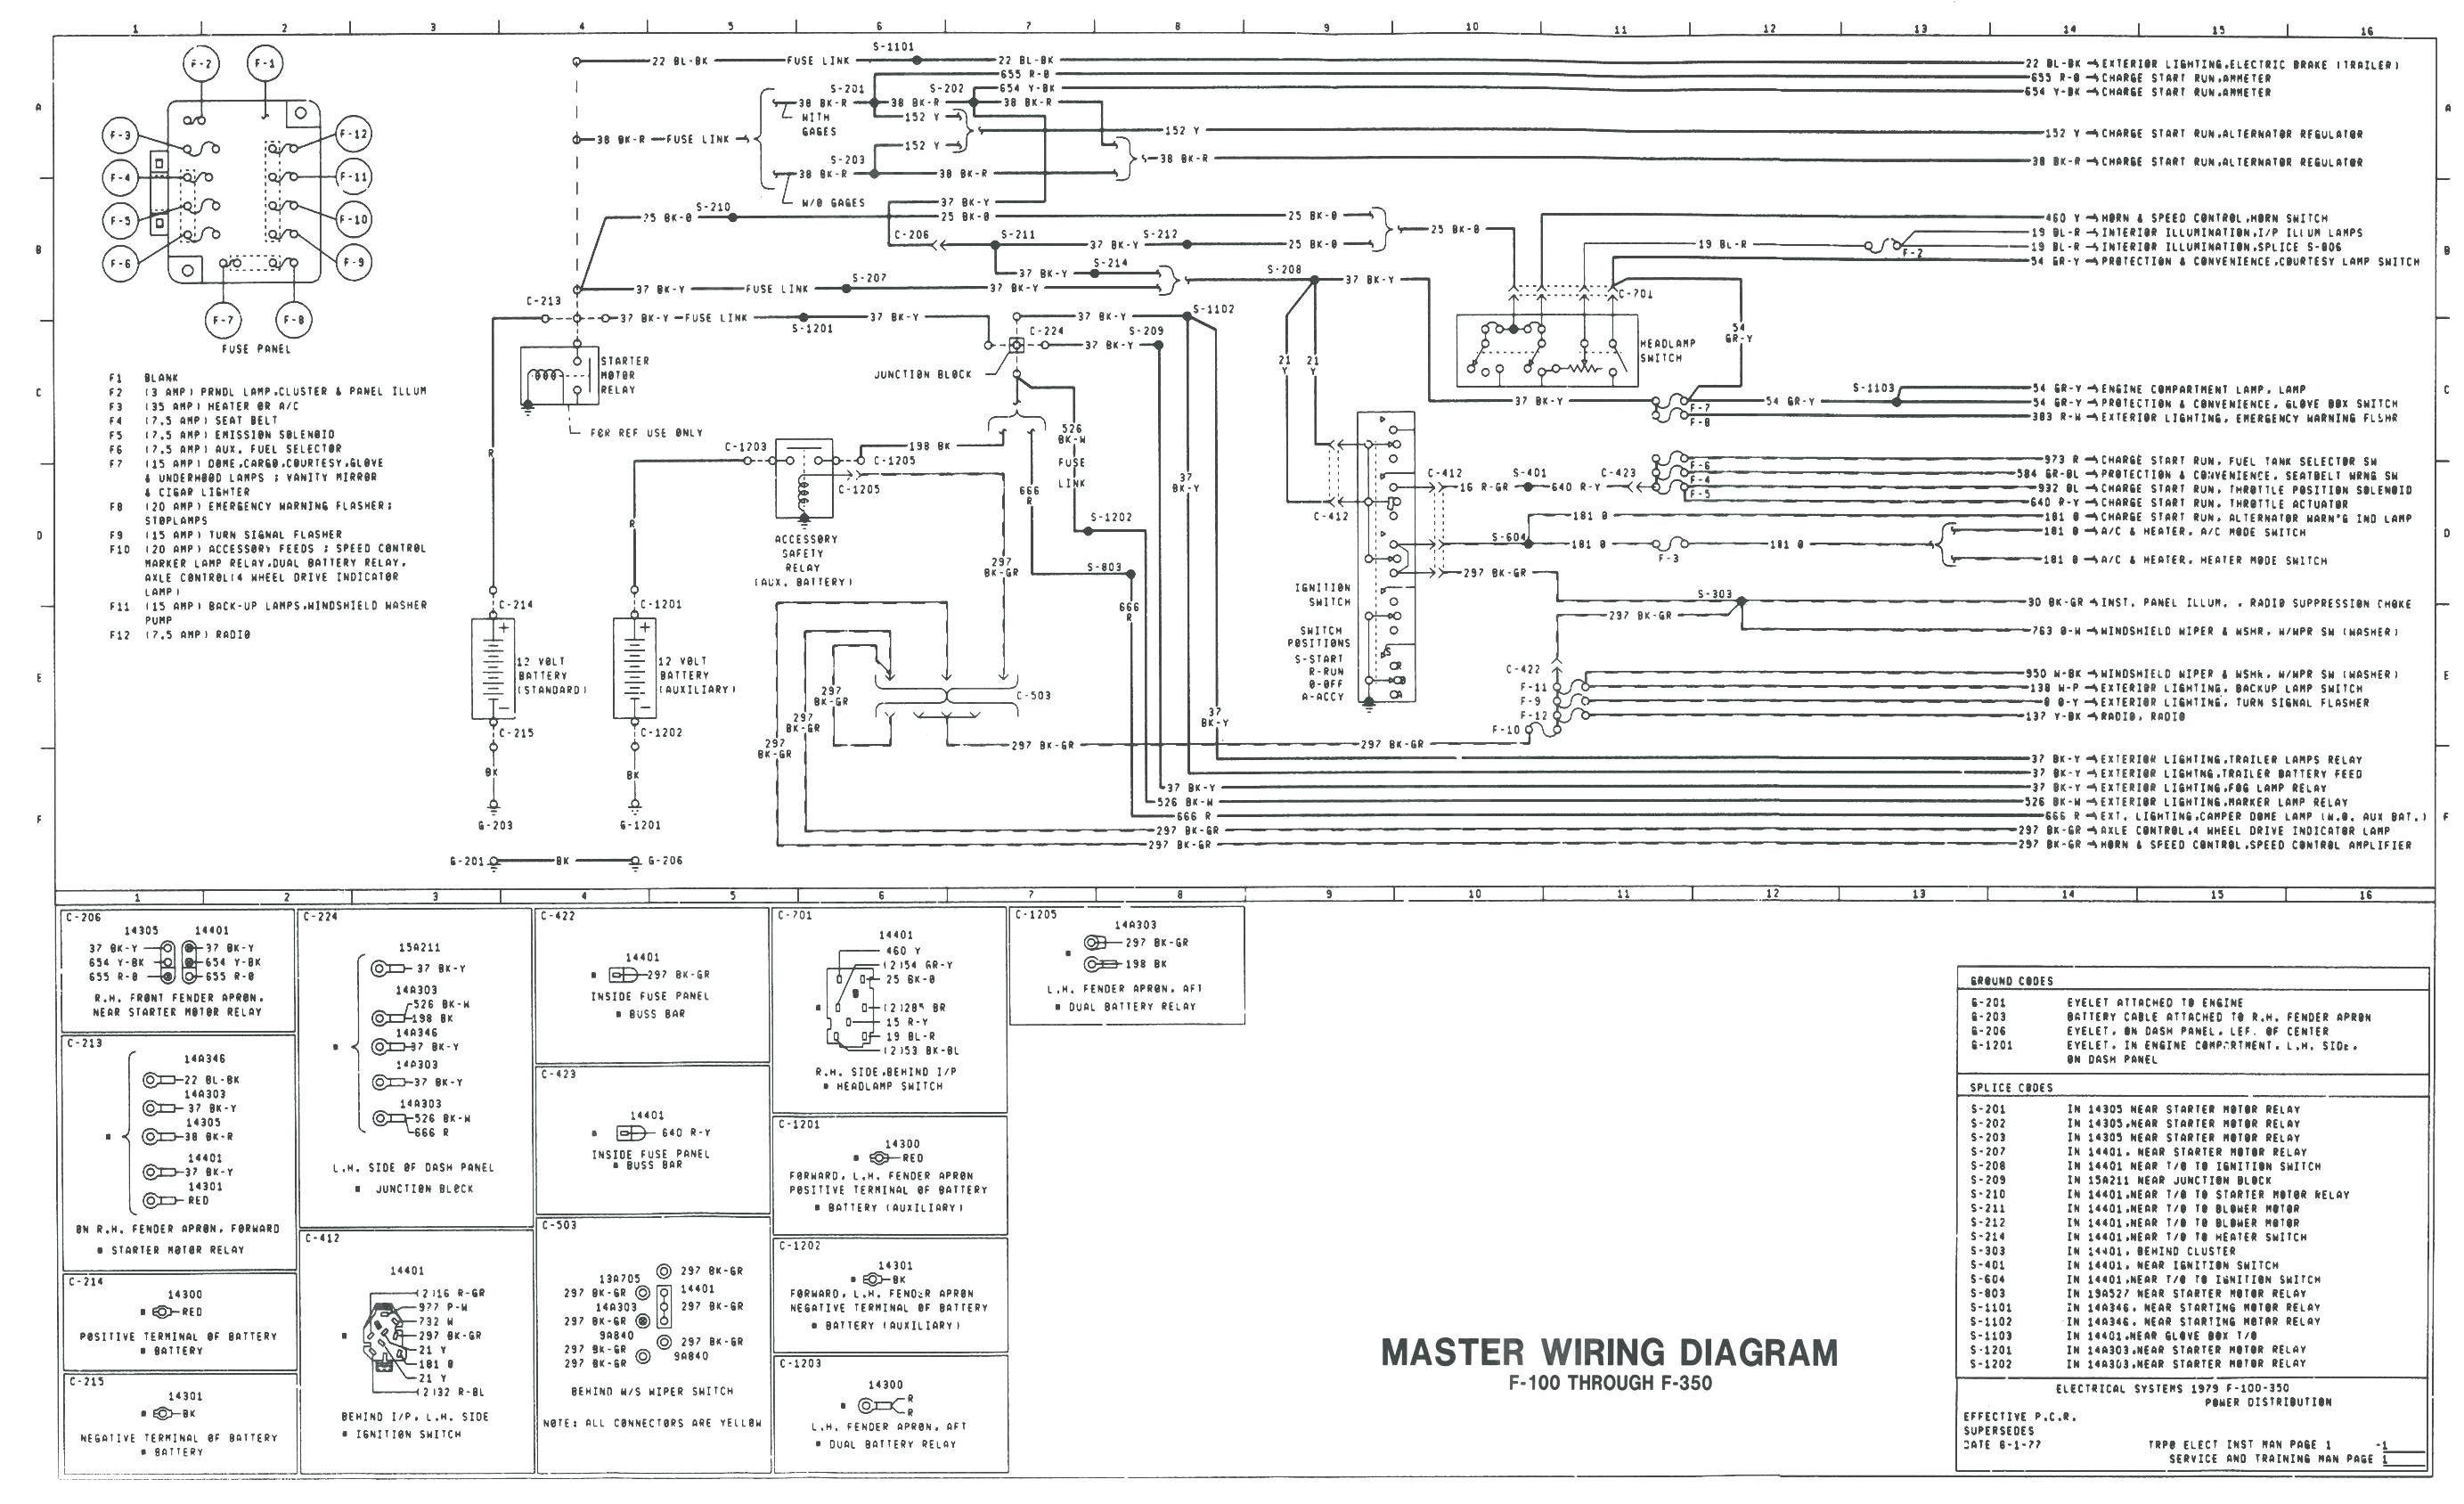 New Wiring Schedule Diagram Wiringdiagram Diagramming Diagramm Visuals Visualisation Graphical Sterling Trucks Diagram Wire